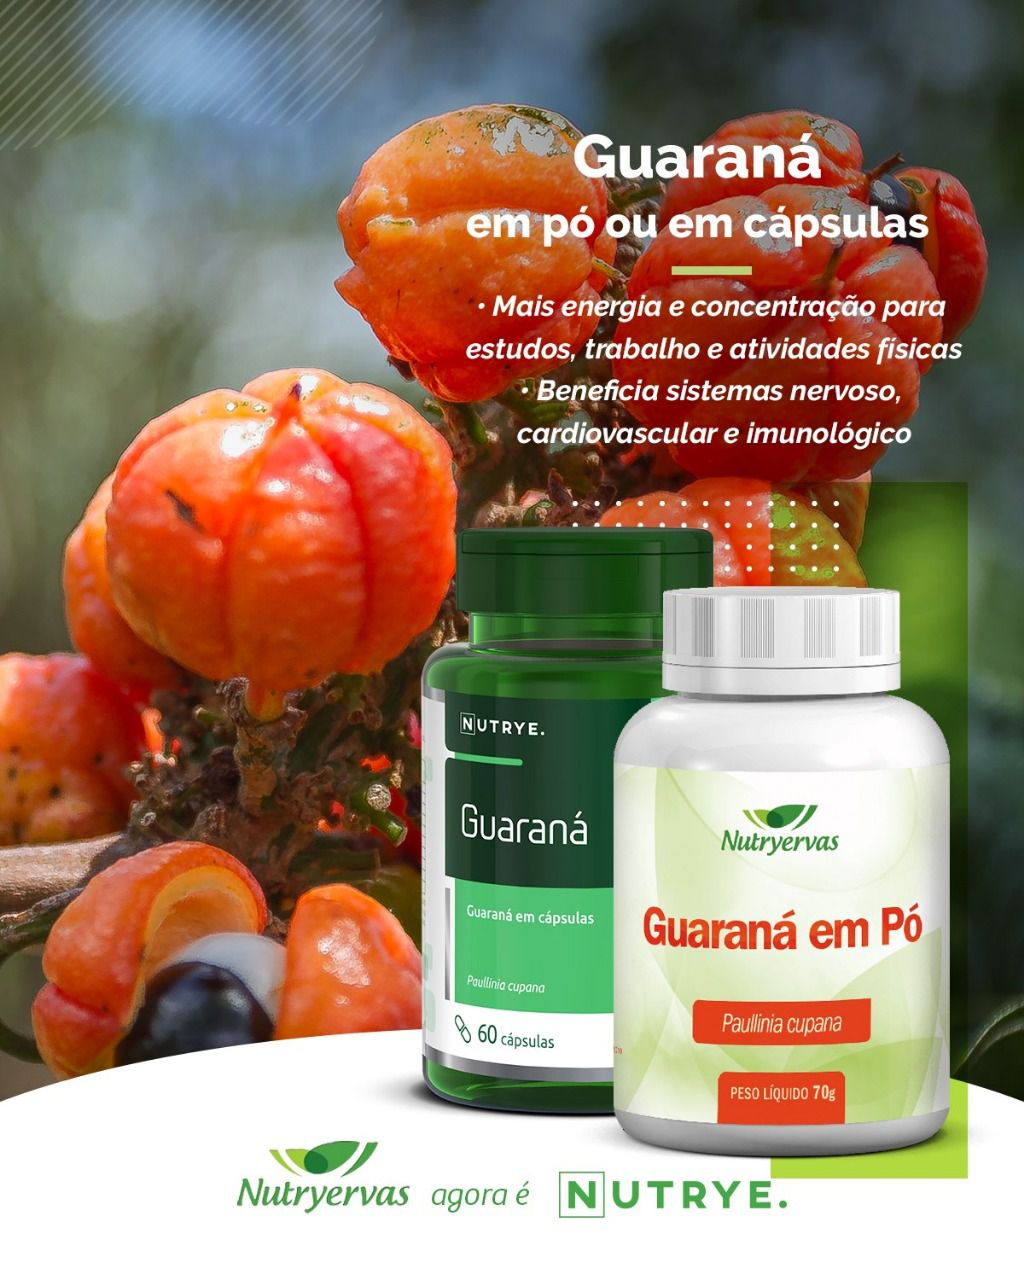 SUPLEMENTO ENERGÉTICO GUARANÁ 60 CÁPSULAS - NUTRYE